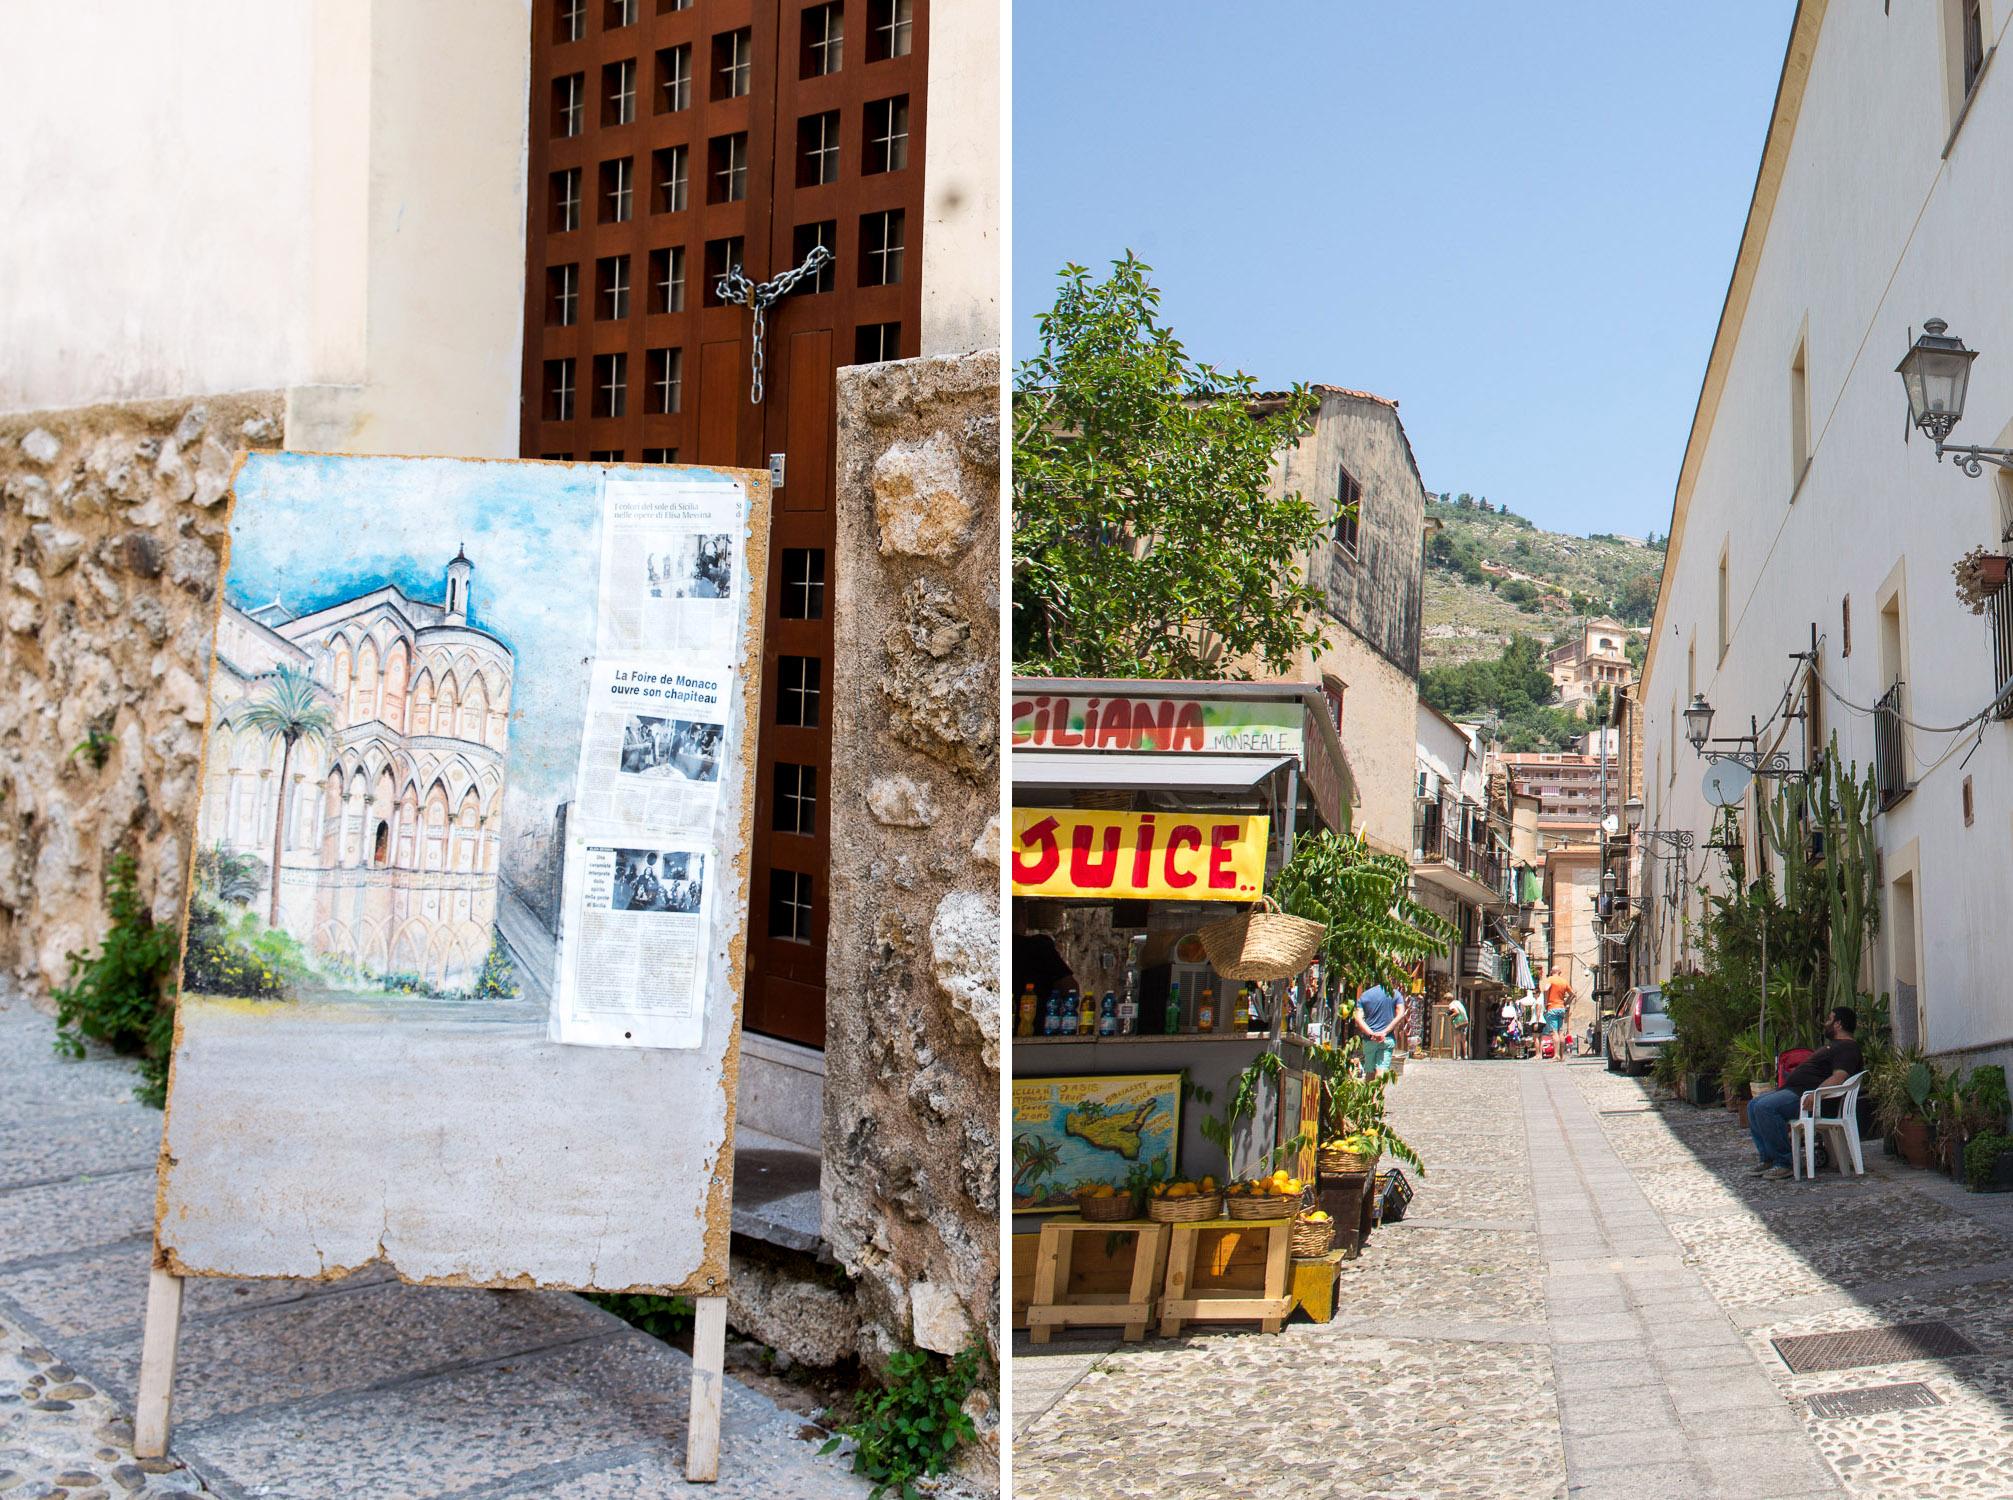 Monreale-Sicily-4 copy